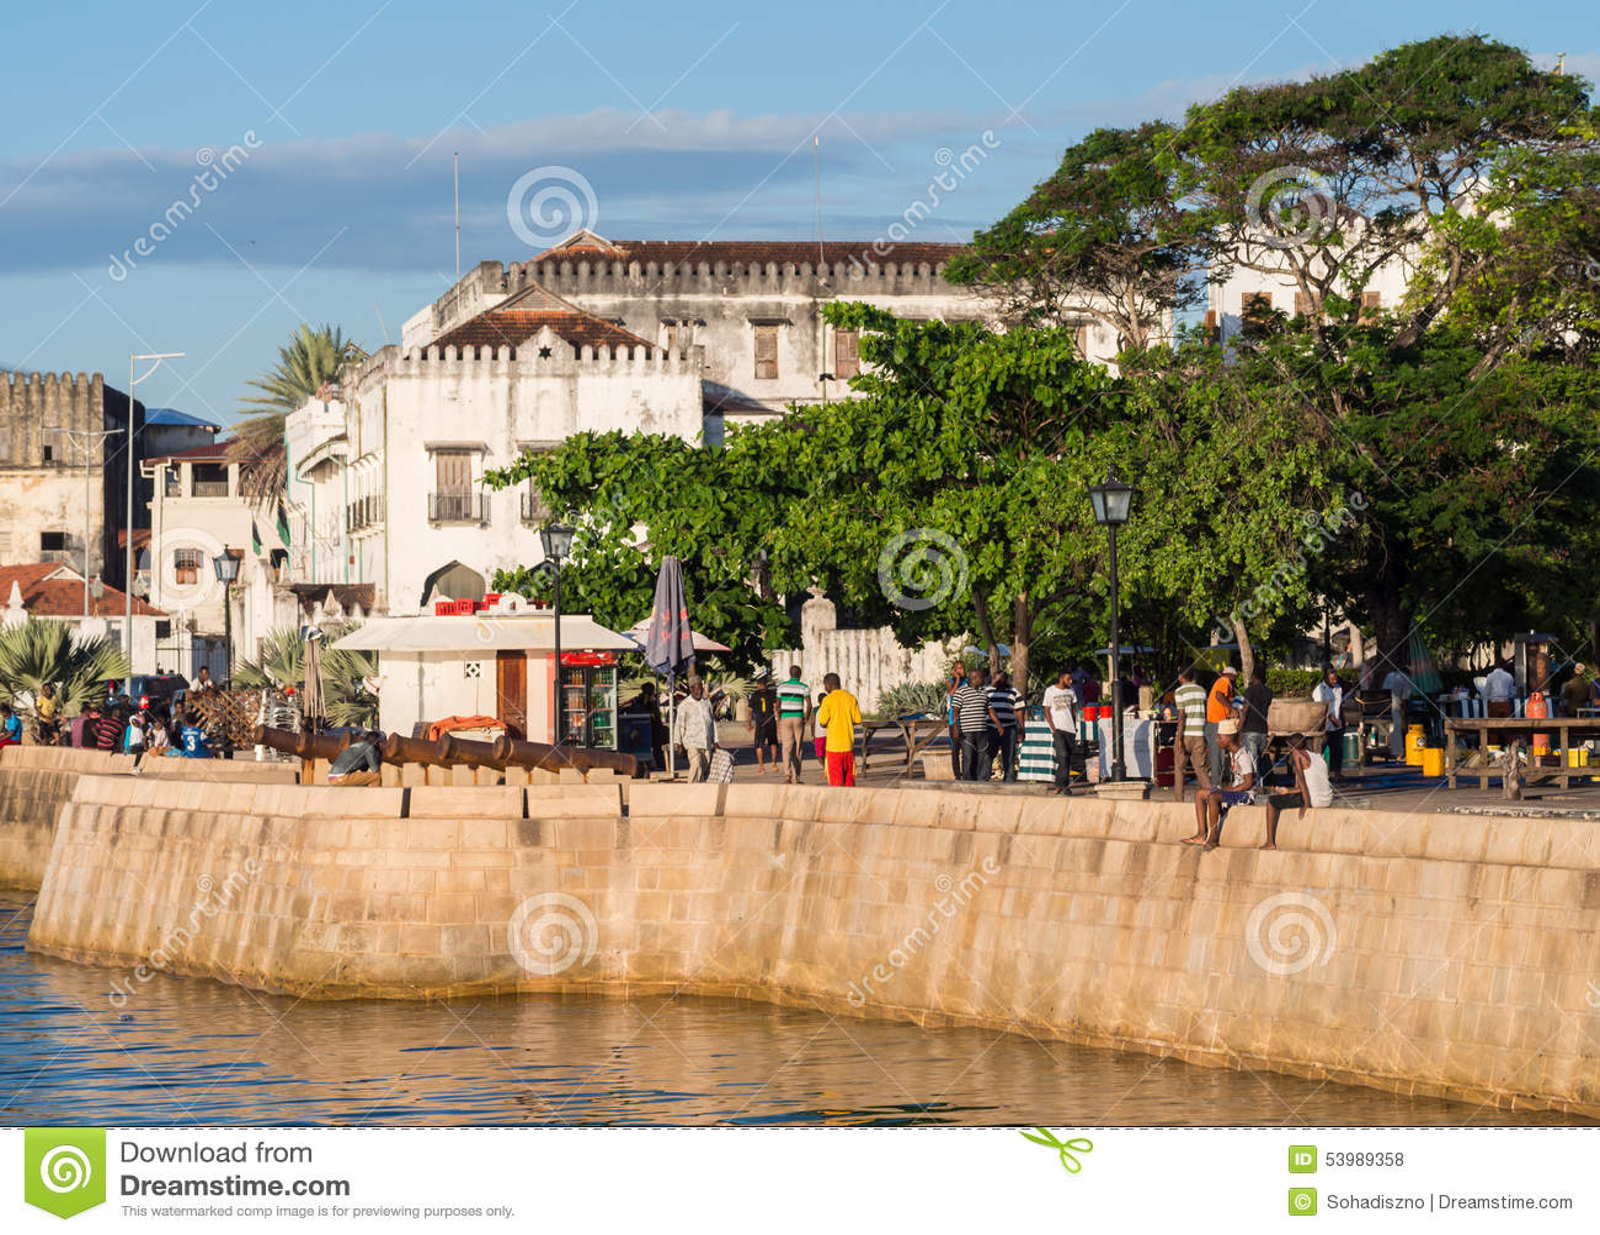 Bord de mer dans la ville en pierre, Zanzibar, Tanzanie